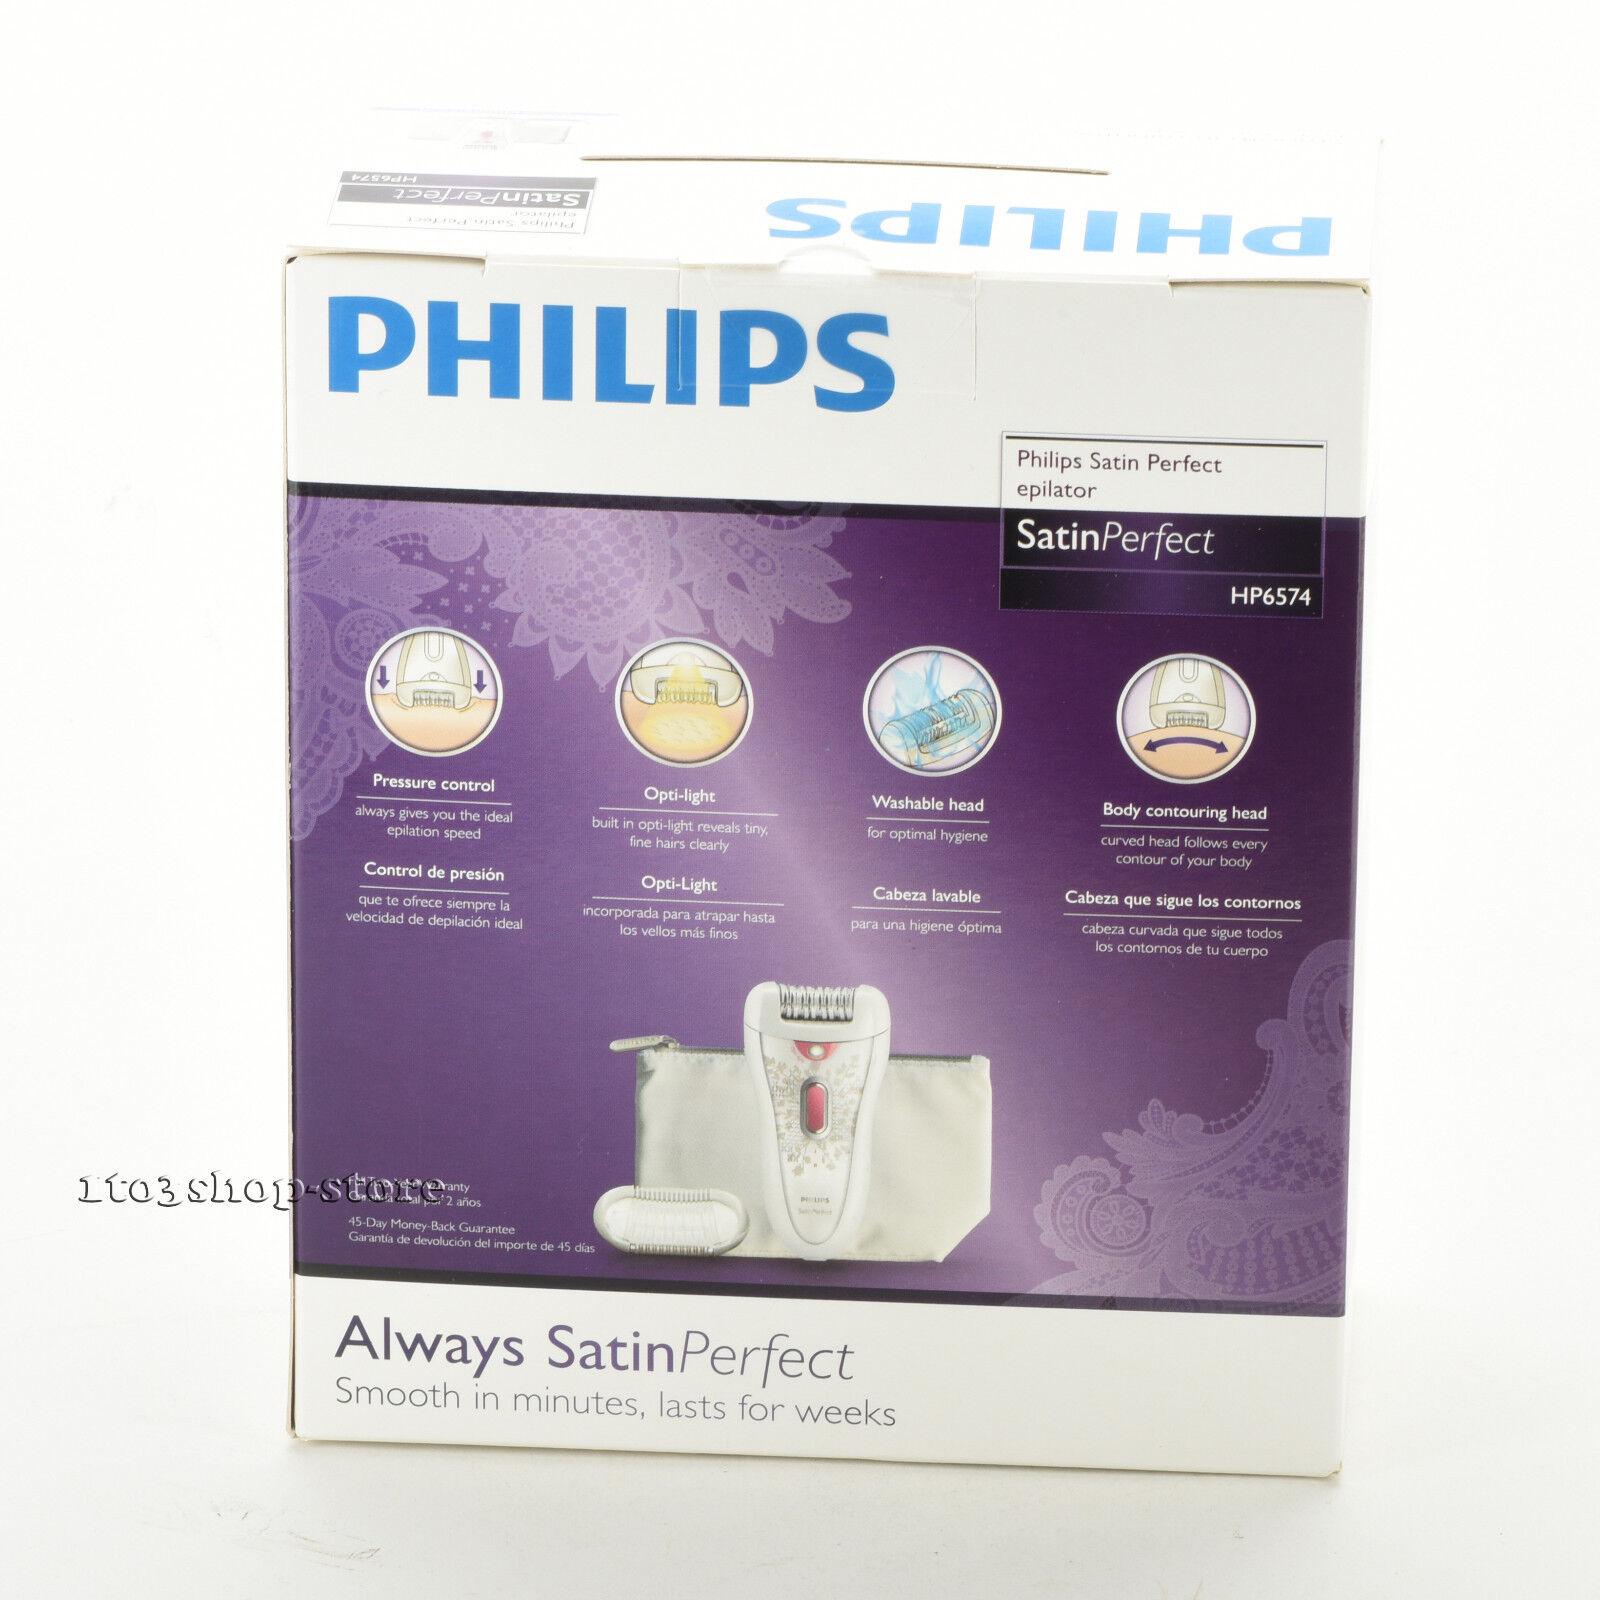 philips satin perfect epilator manual